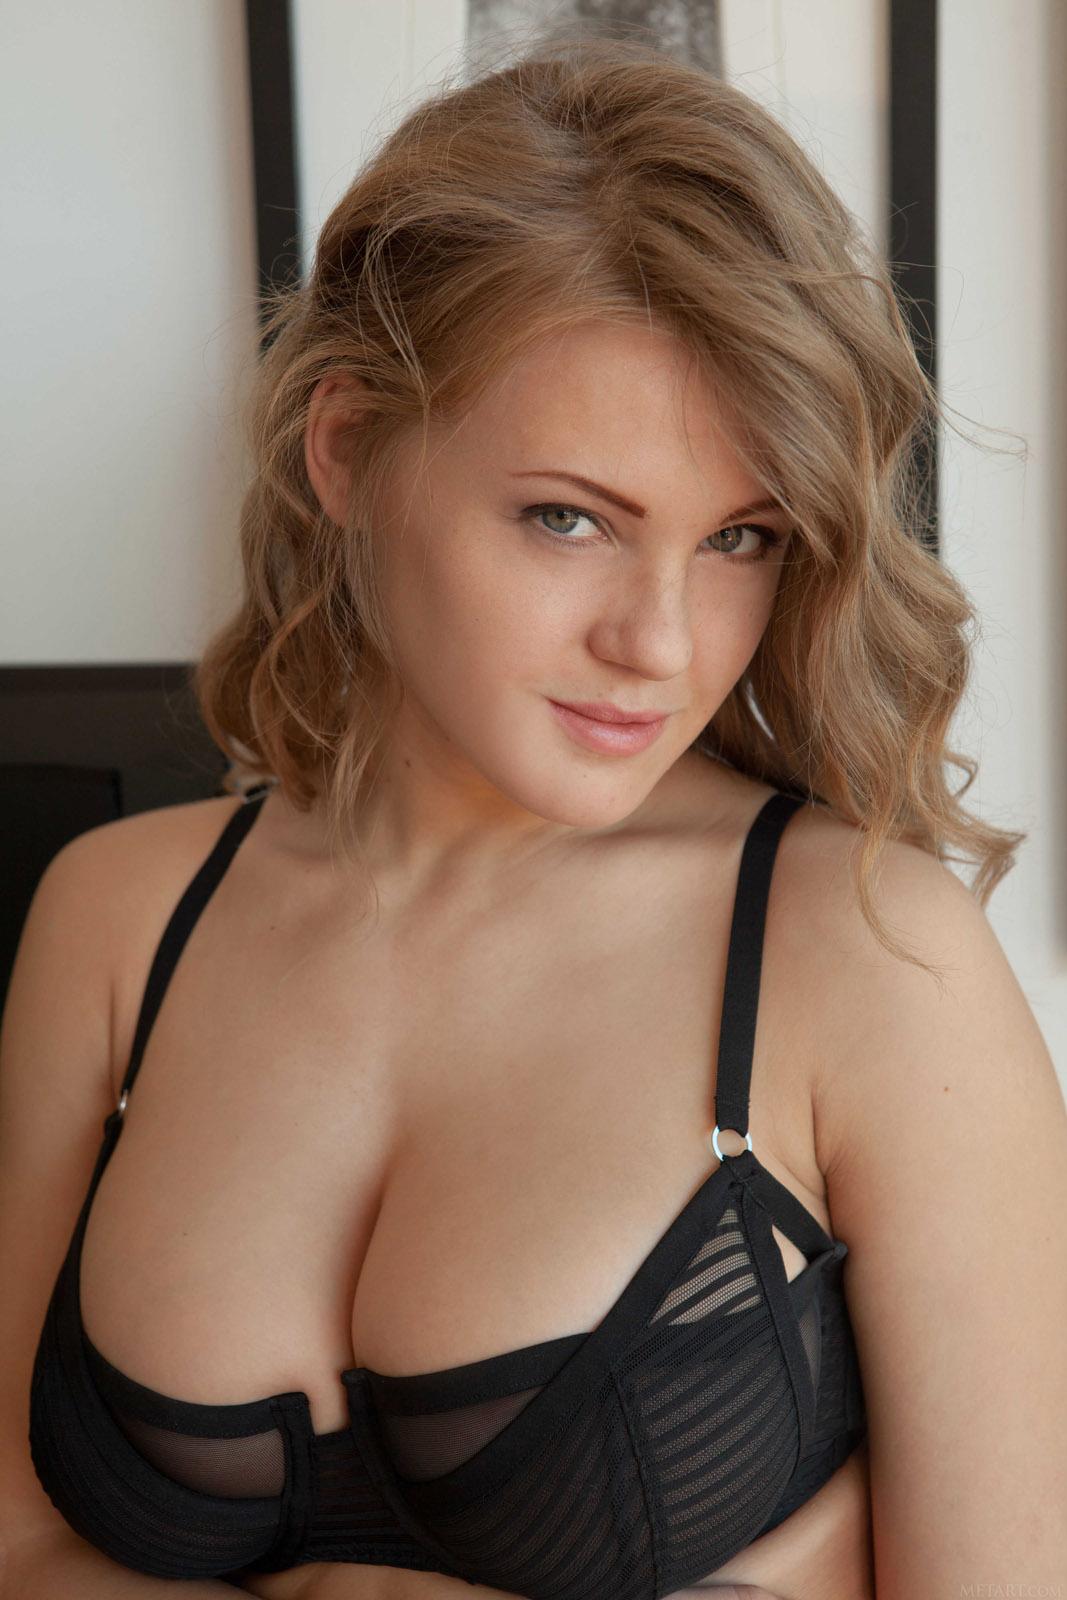 Amateur big boobed girlfriend sucks dick 6